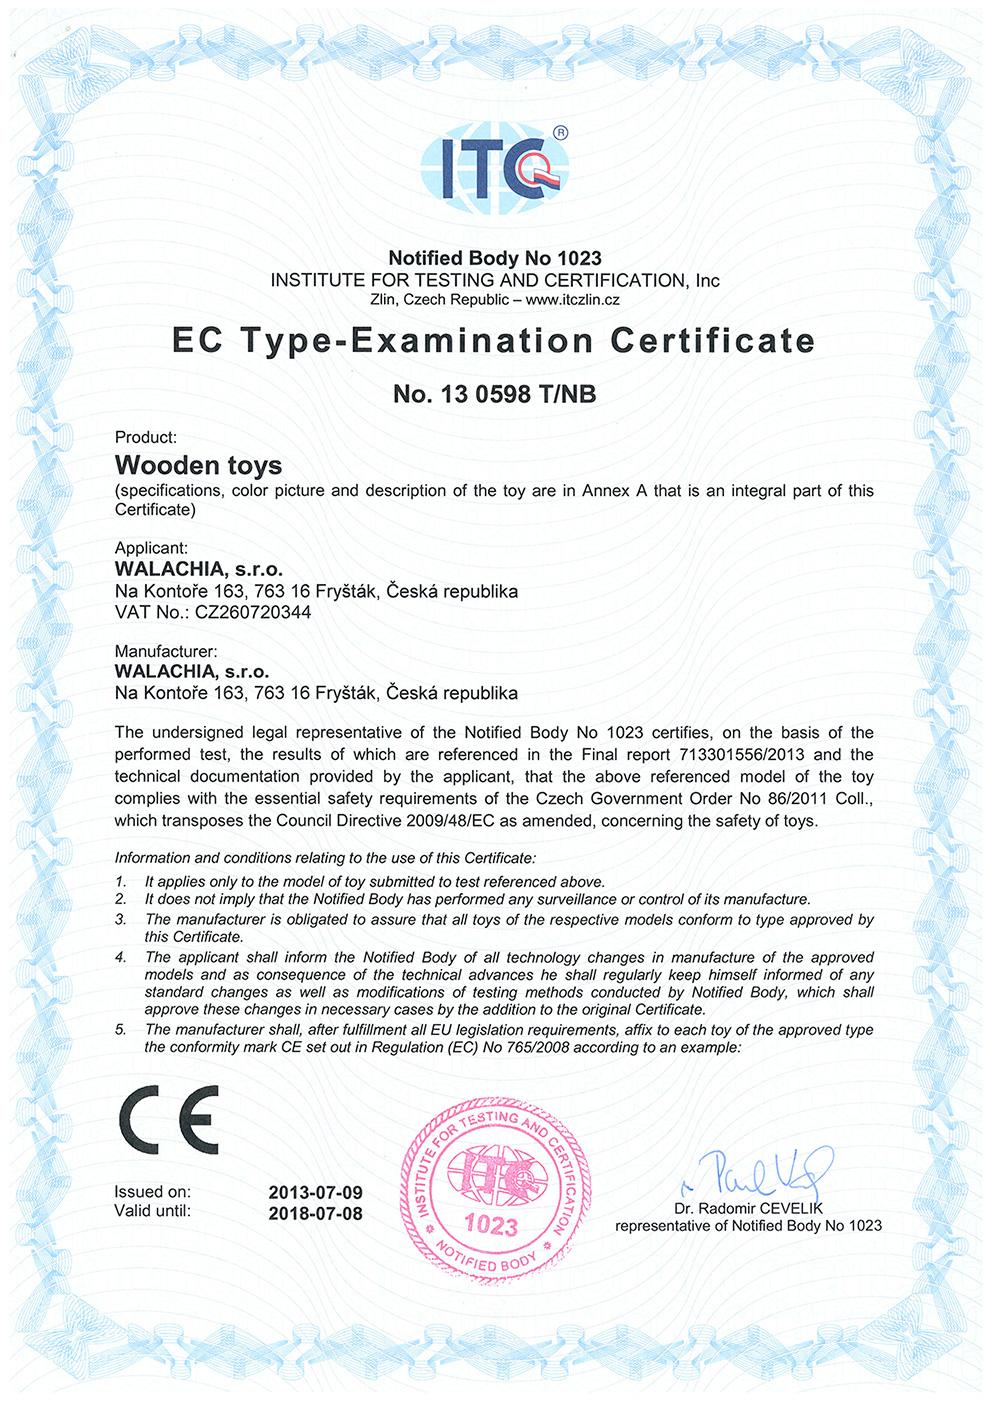 EC type examination certificate